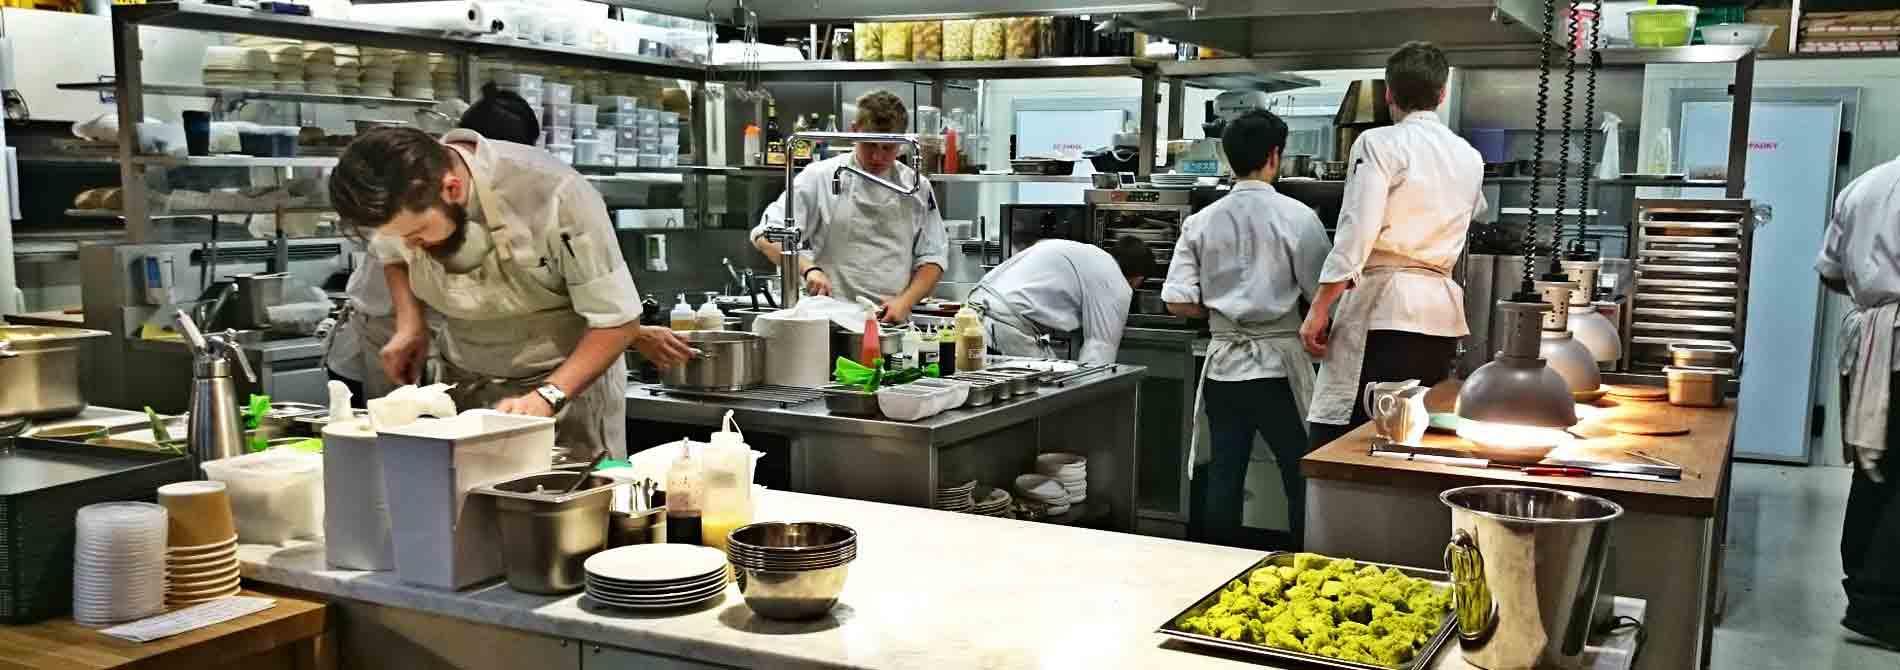 Commercial kitchen equipment supplier in dubai UAE